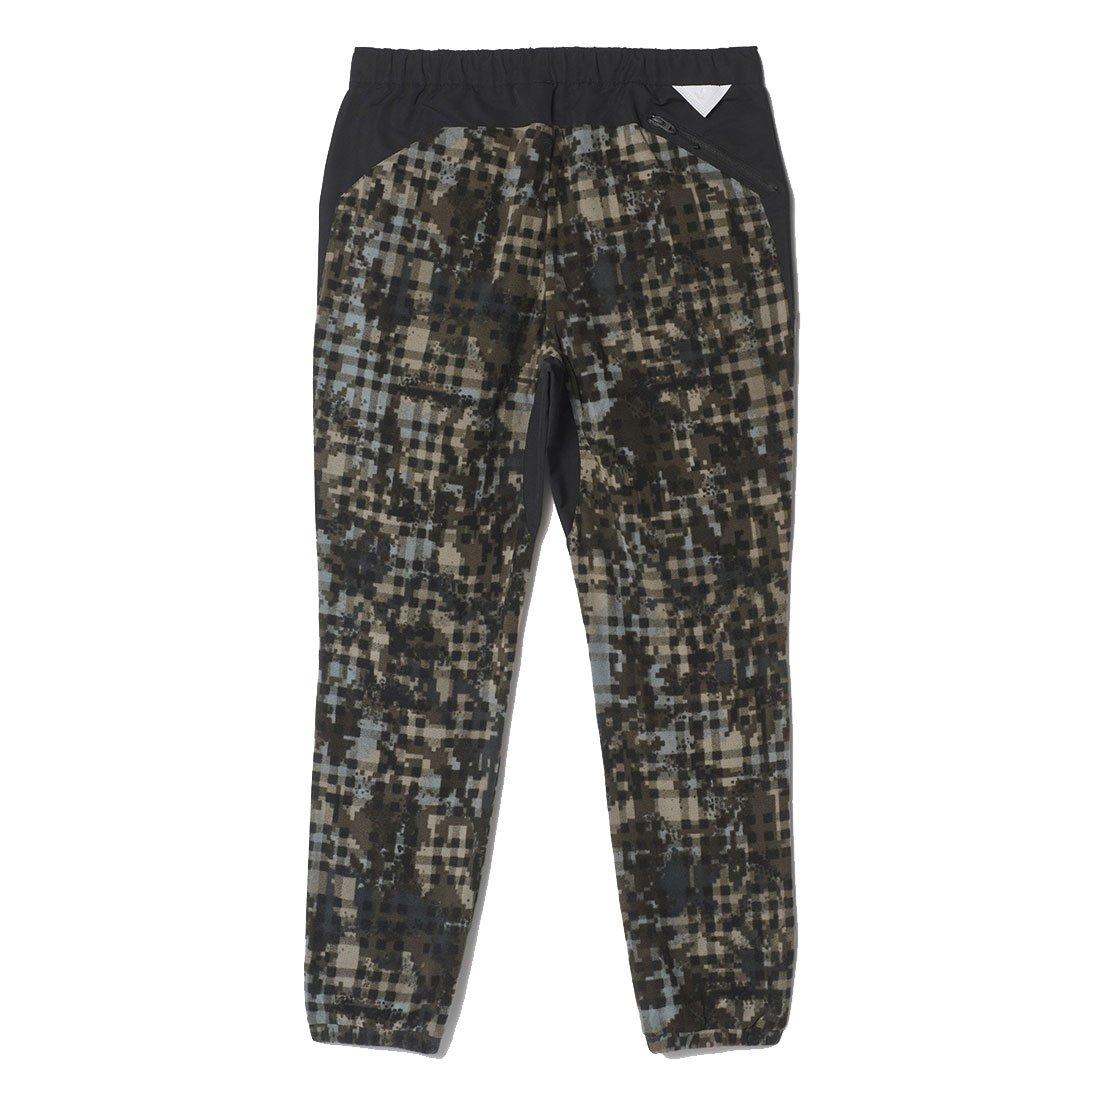 950654e15c3d Adidas Men White Mountaineering Track Pants (multi) at Amazon Men s  Clothing store